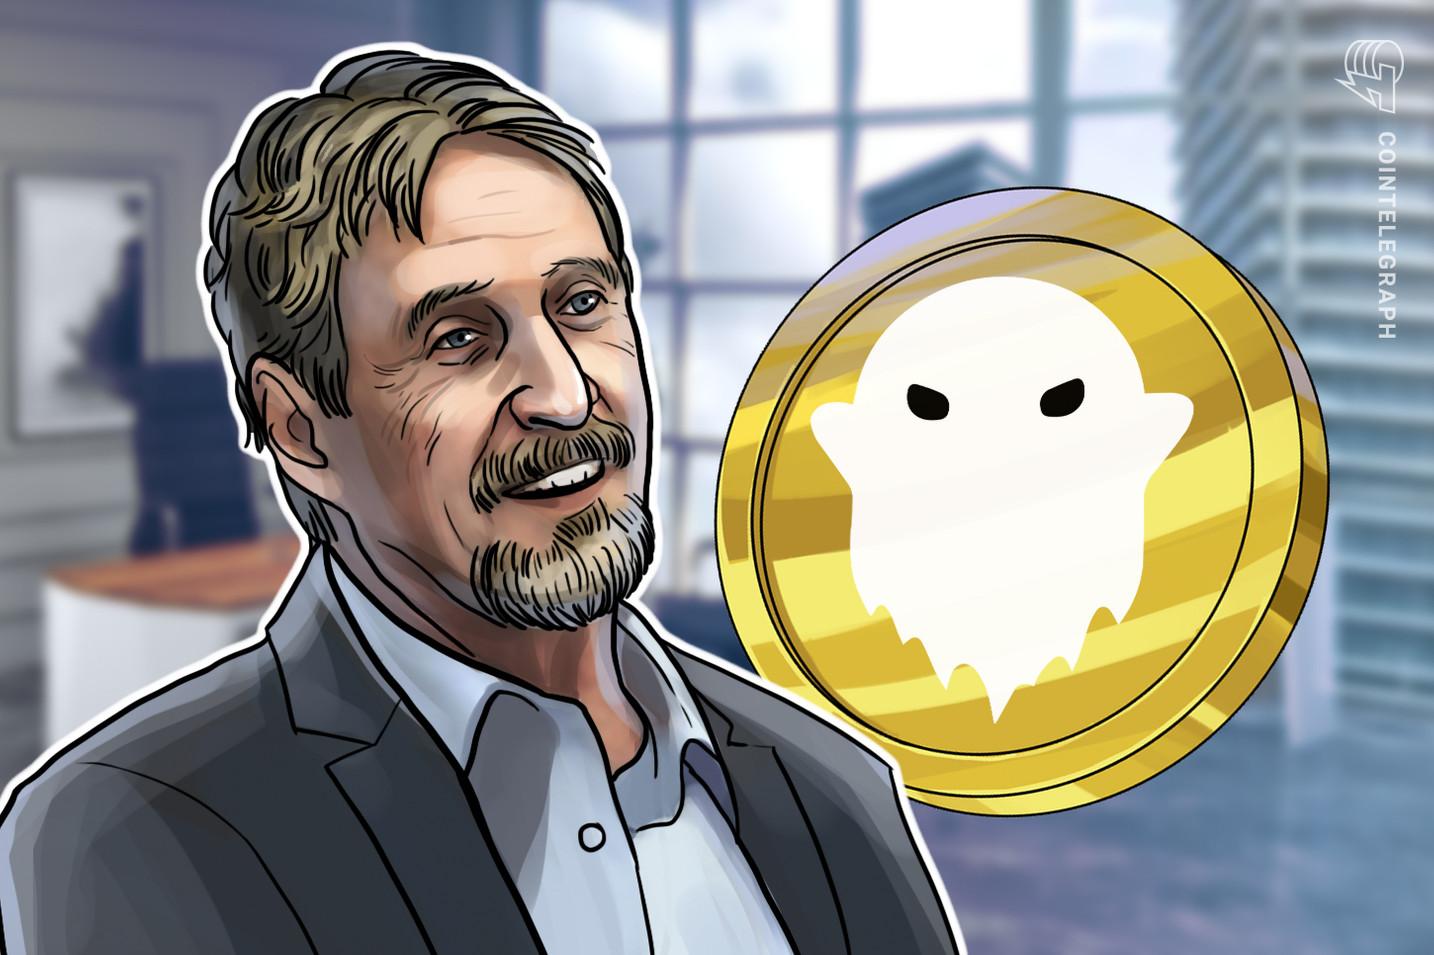 John McAfee esclarece que ainda faz parte do ecossistema do GHOST